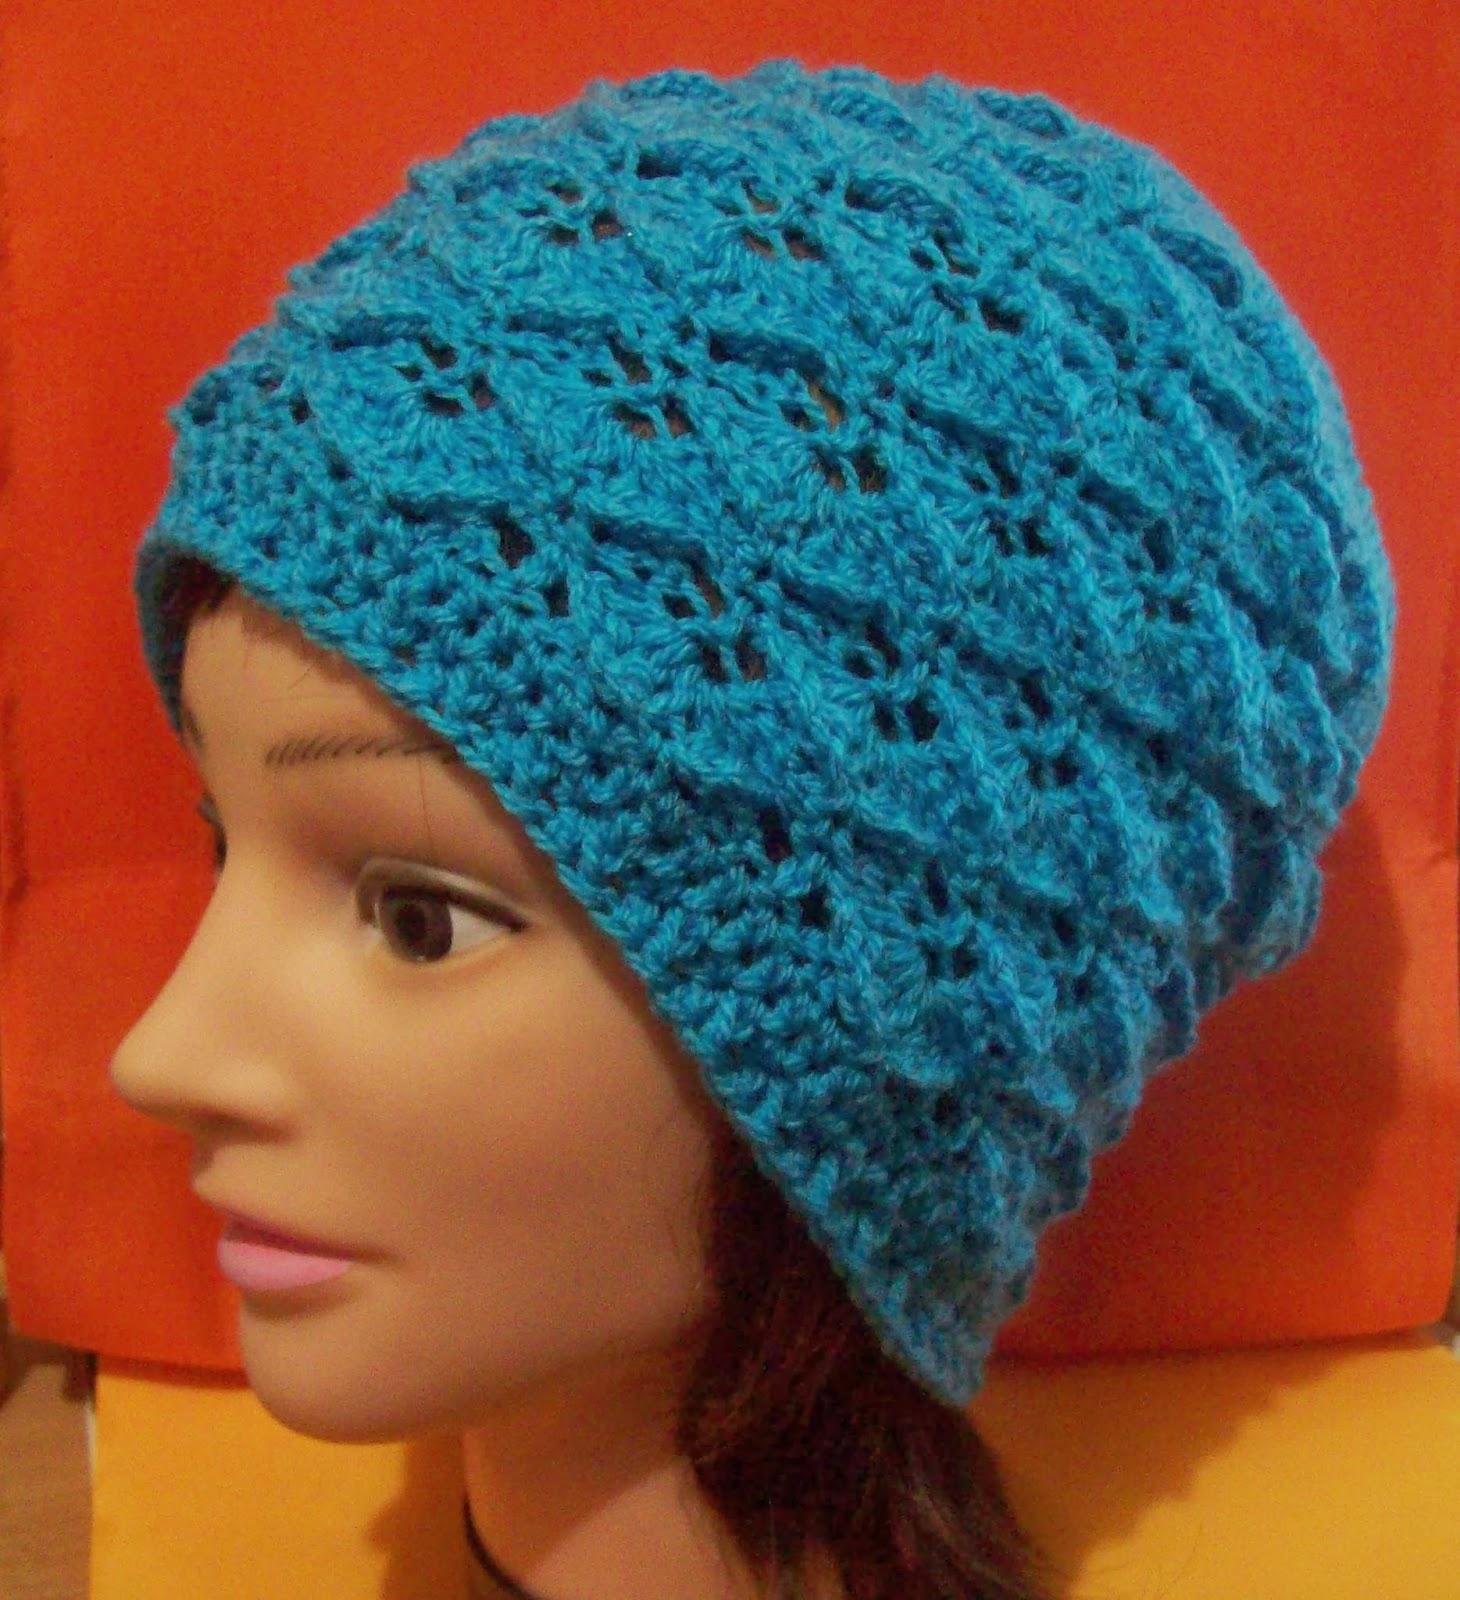 Free Crochet Hat Pattern For Adults